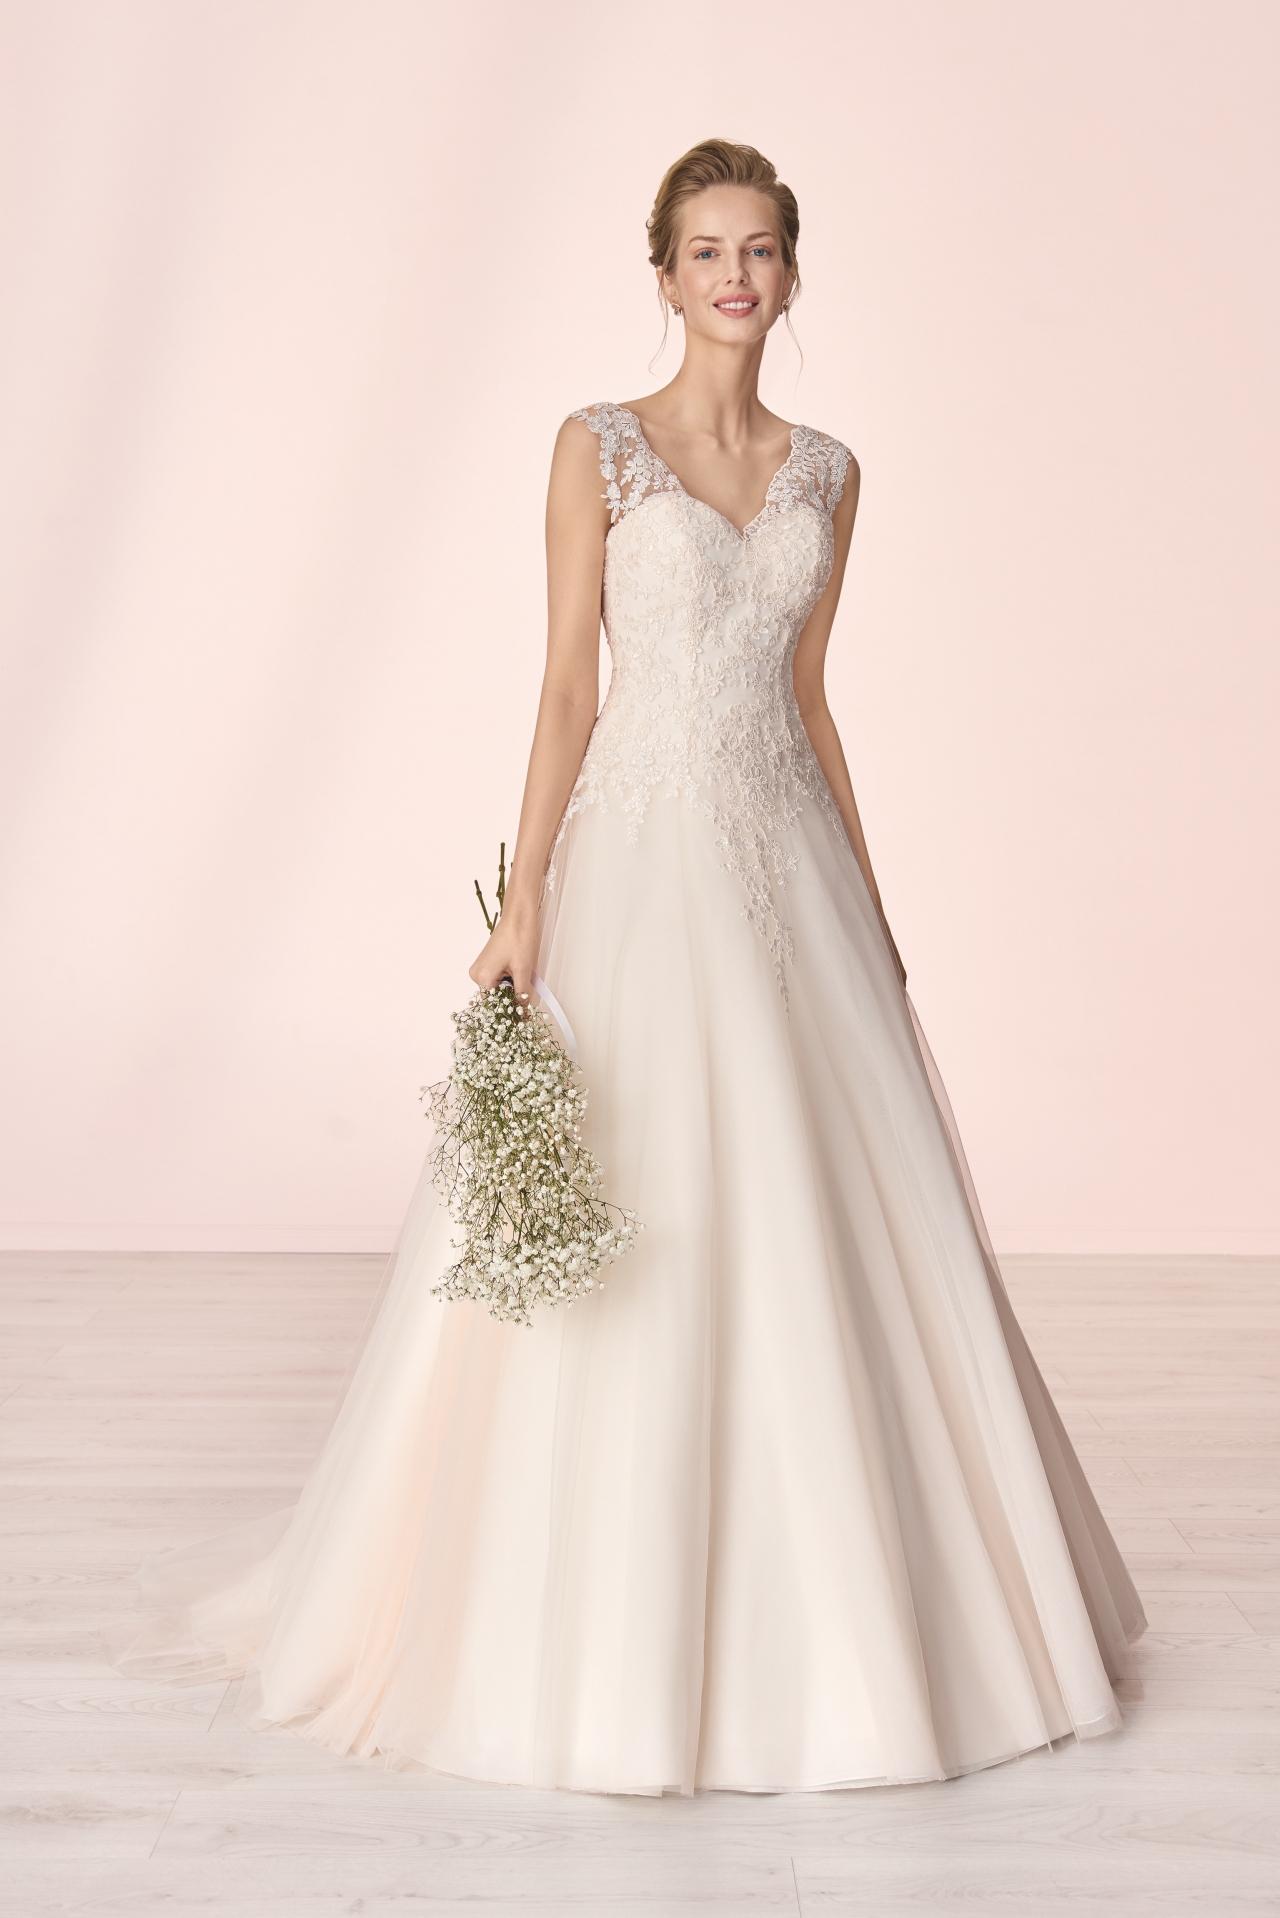 Brautkleid Elizabeth Konin 2019 - 4111T-0